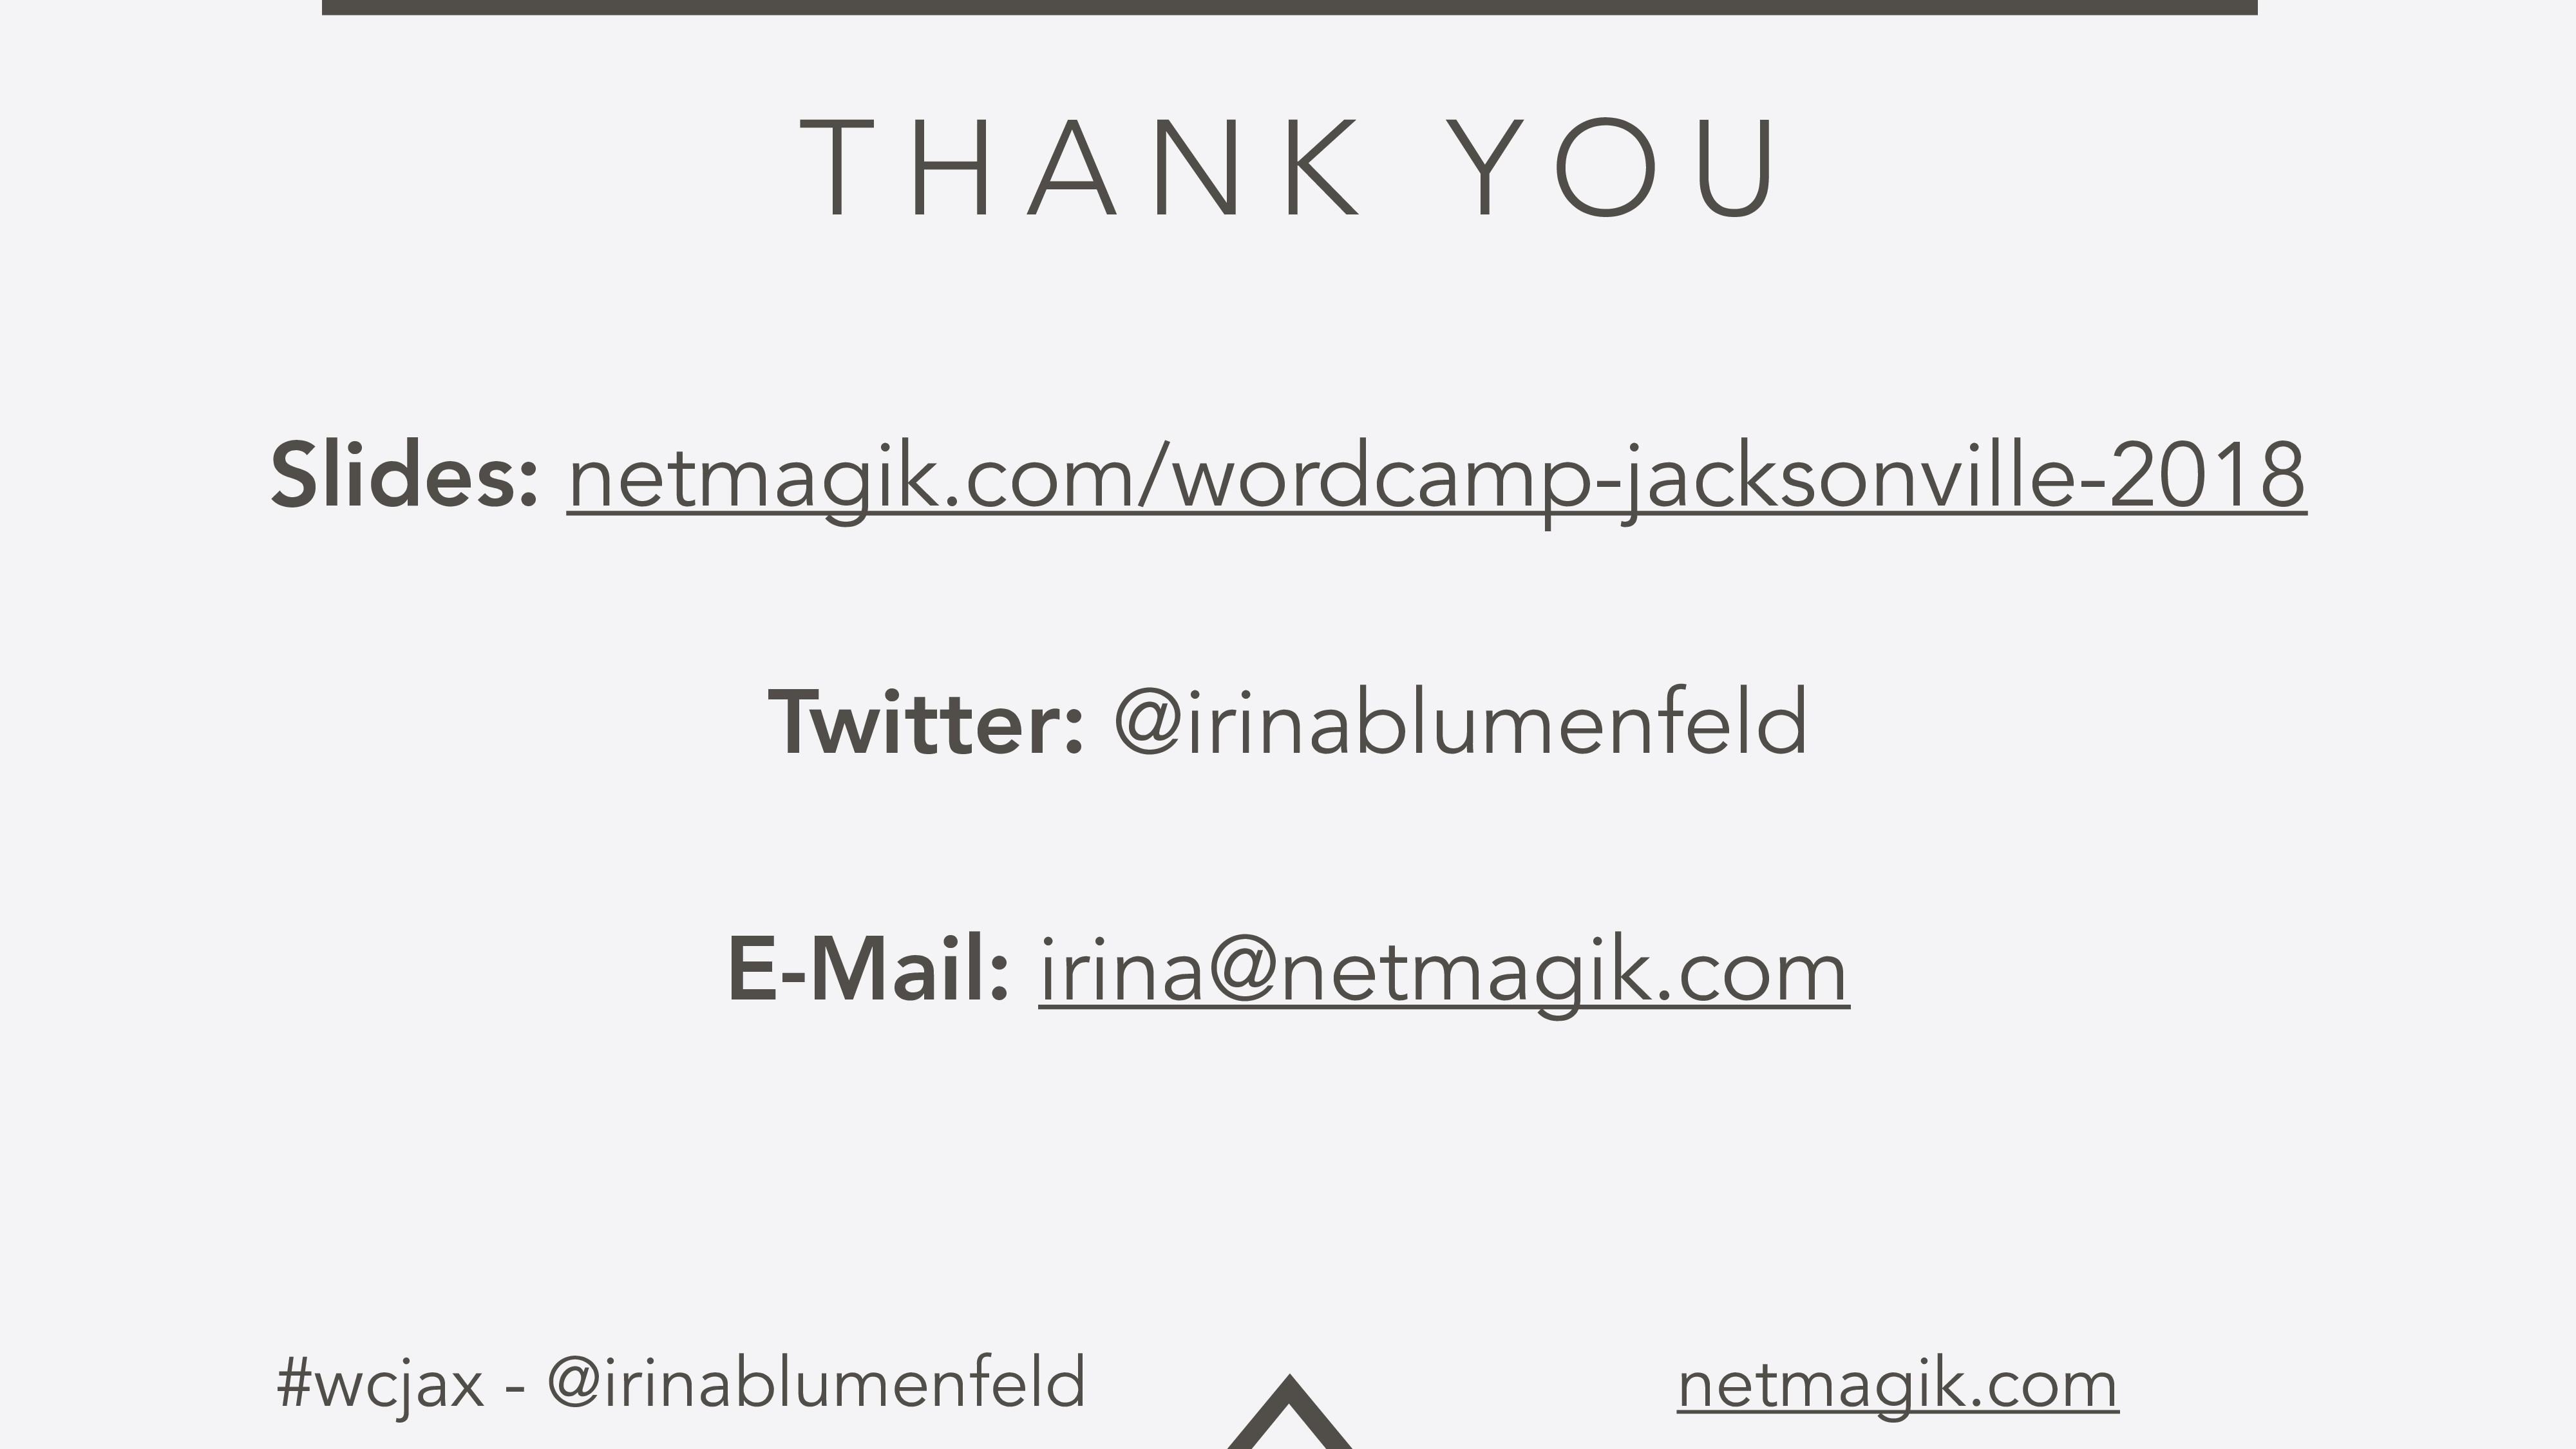 #wcjax - @irinablumenfeld netmagik.com T H A N ...